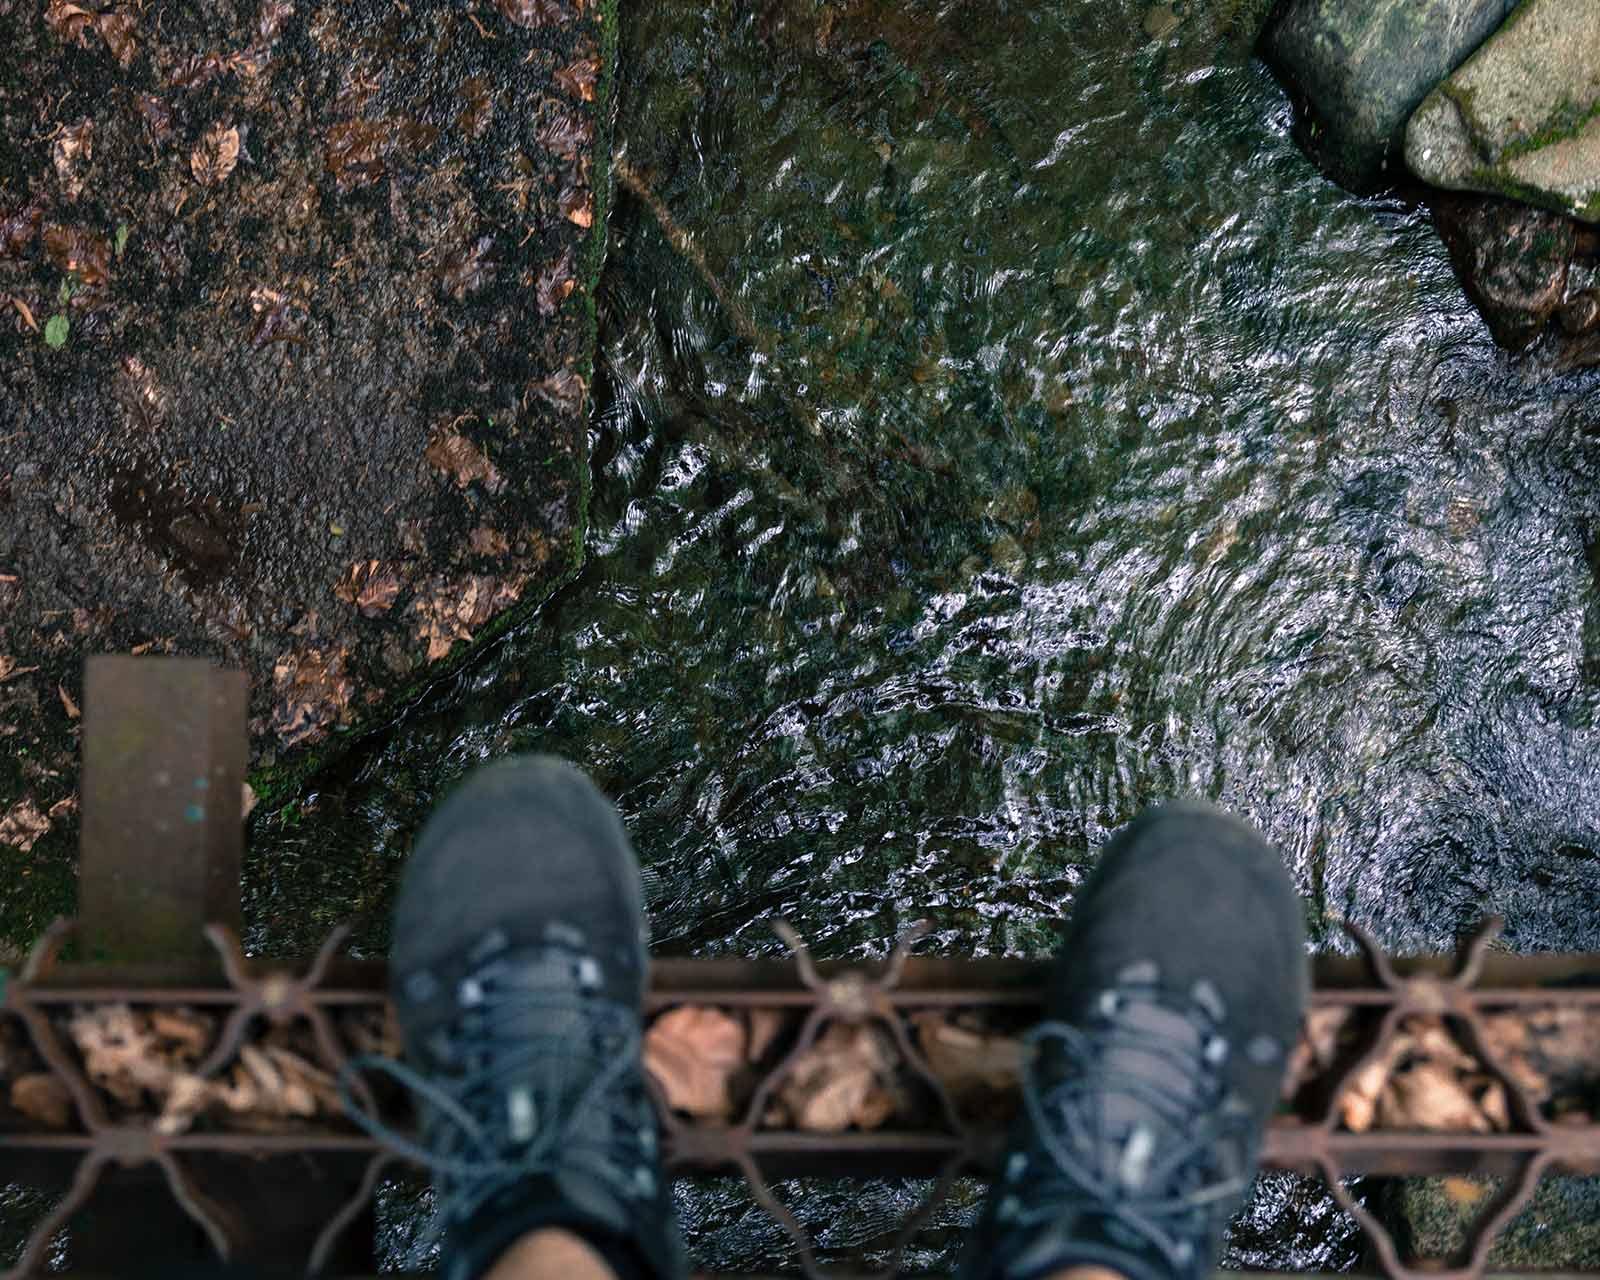 Standing on the edge of a steel bridge